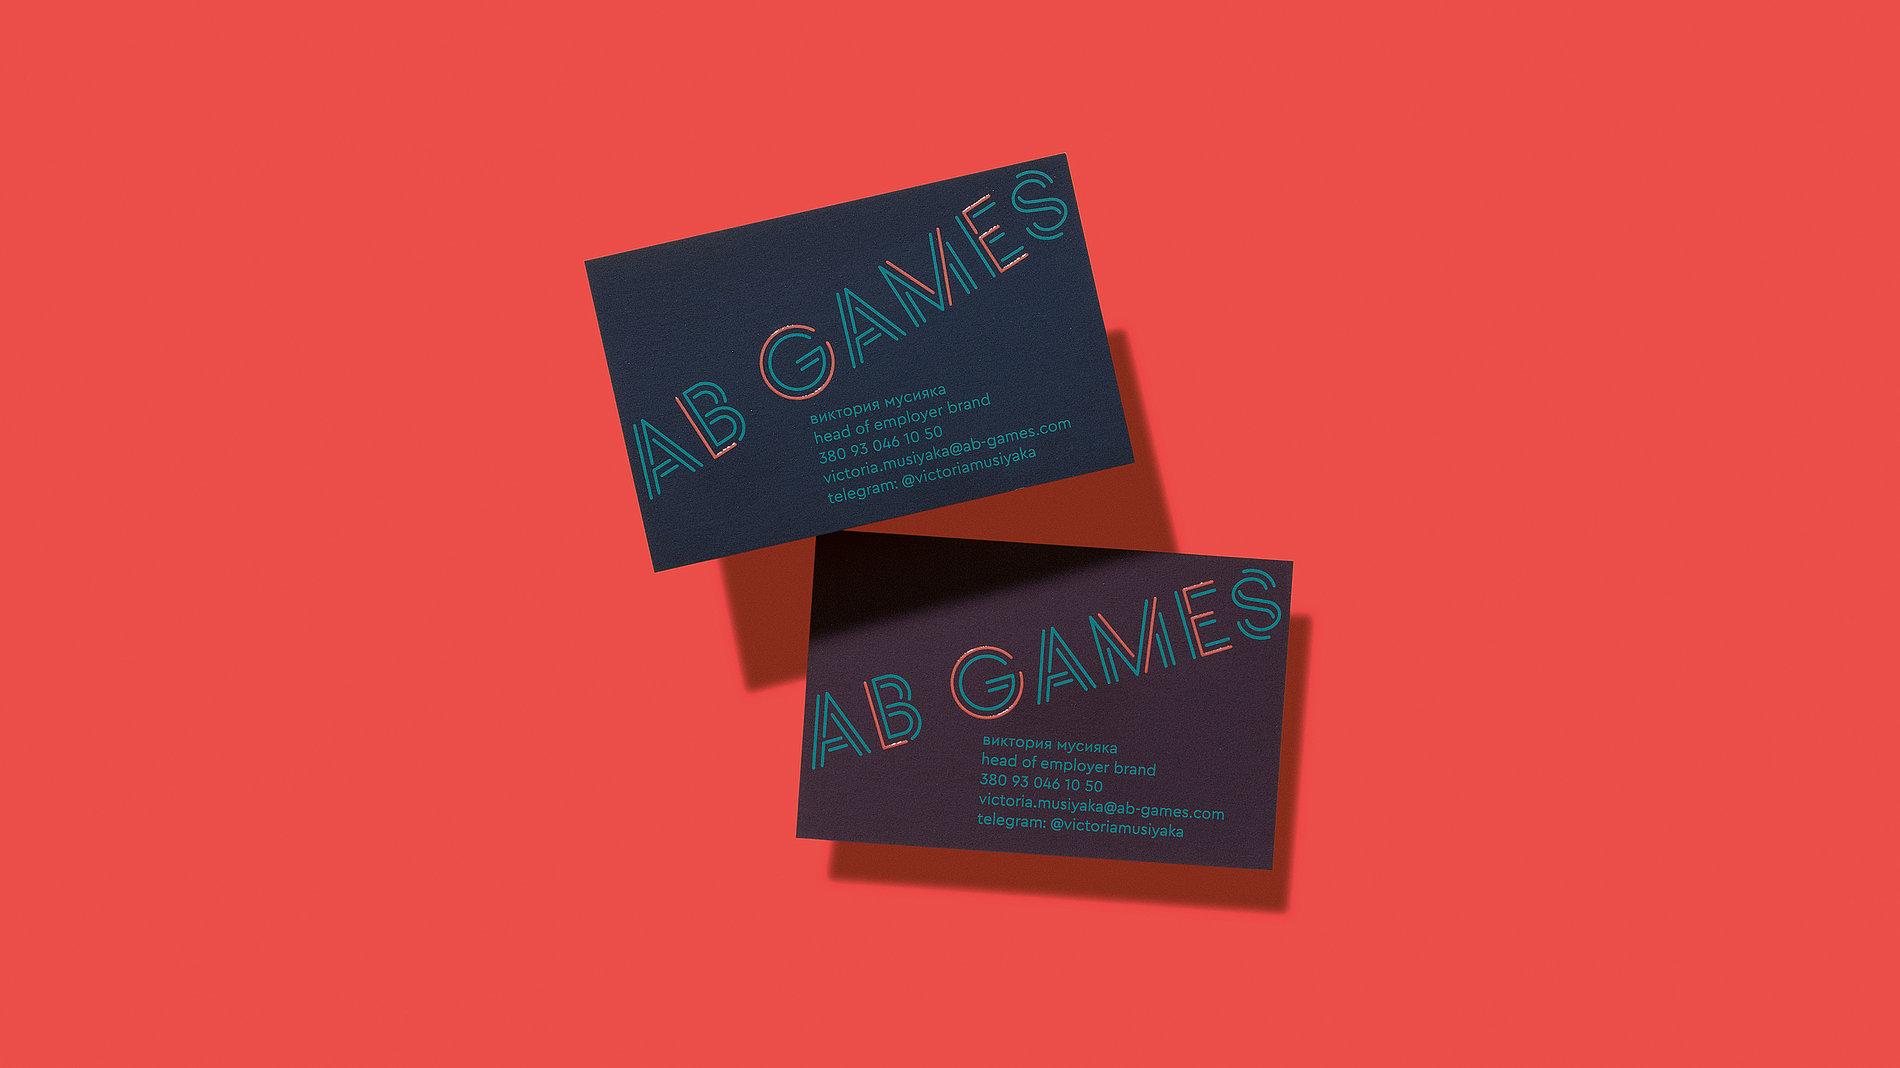 AB Games | Red Dot Design Award